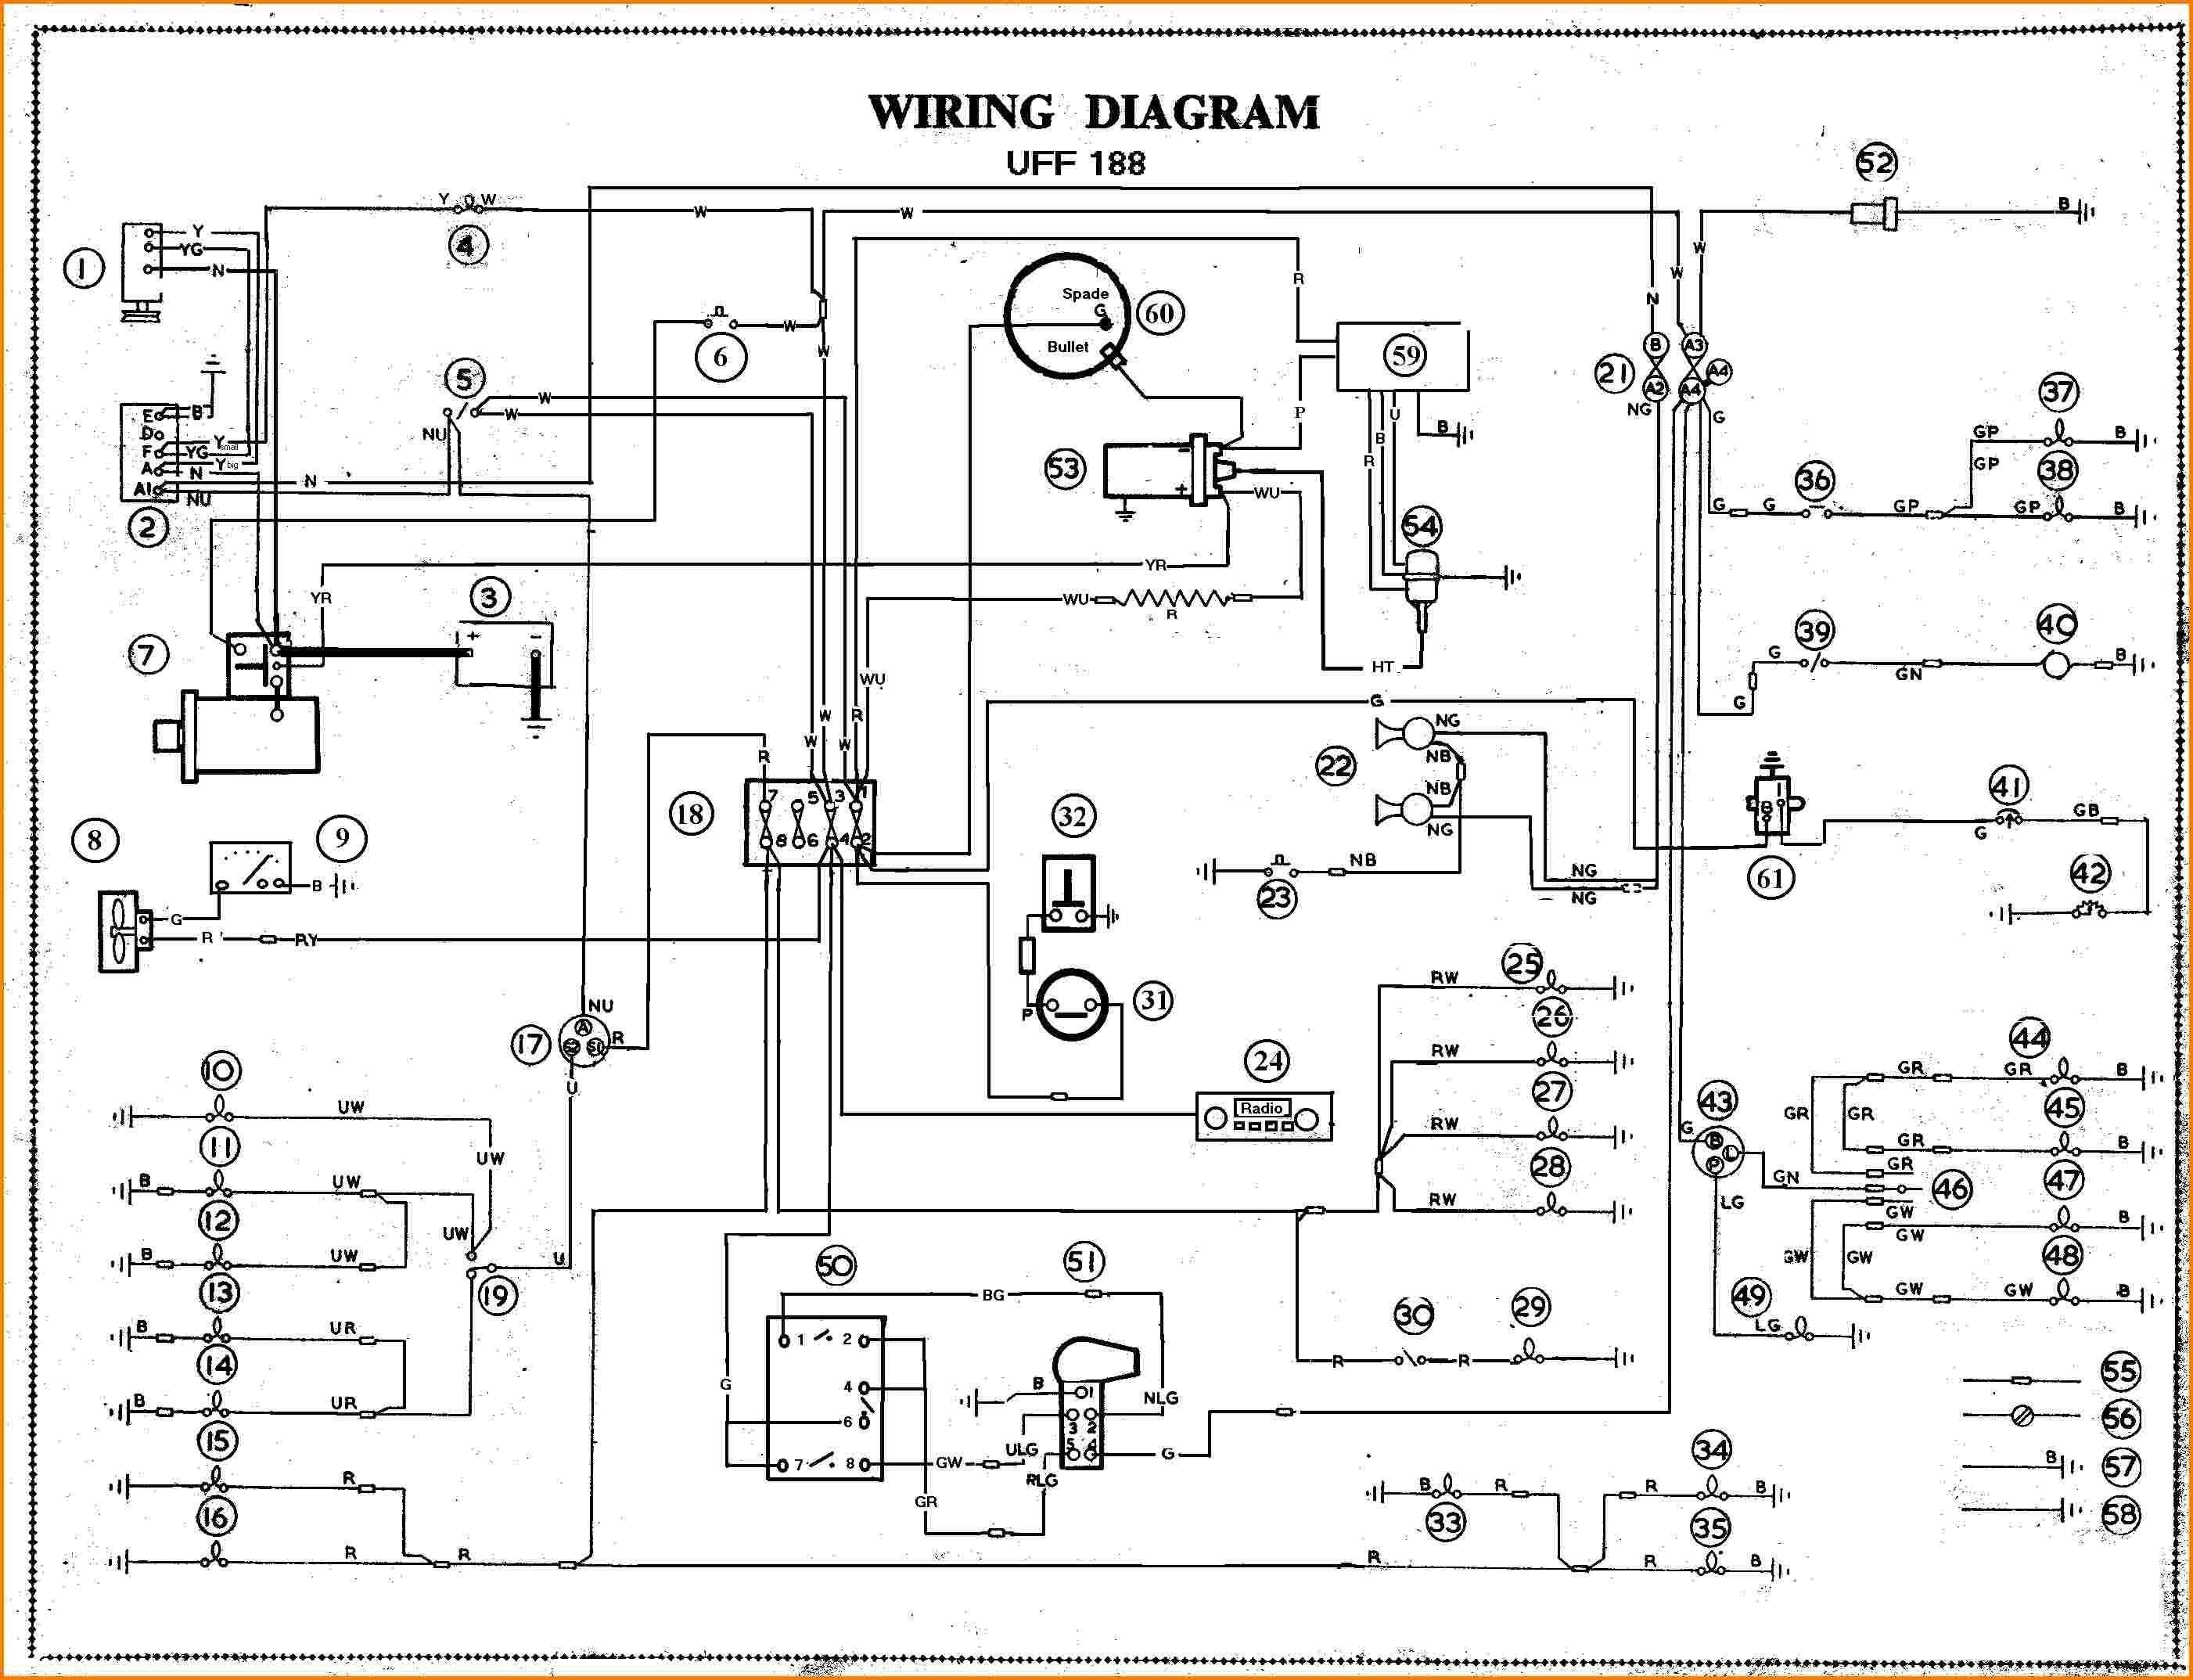 VC_2706] Drag Race Car Wiring Diagram Schematic WiringBarep Lite Cajos Mohammedshrine Librar Wiring 101